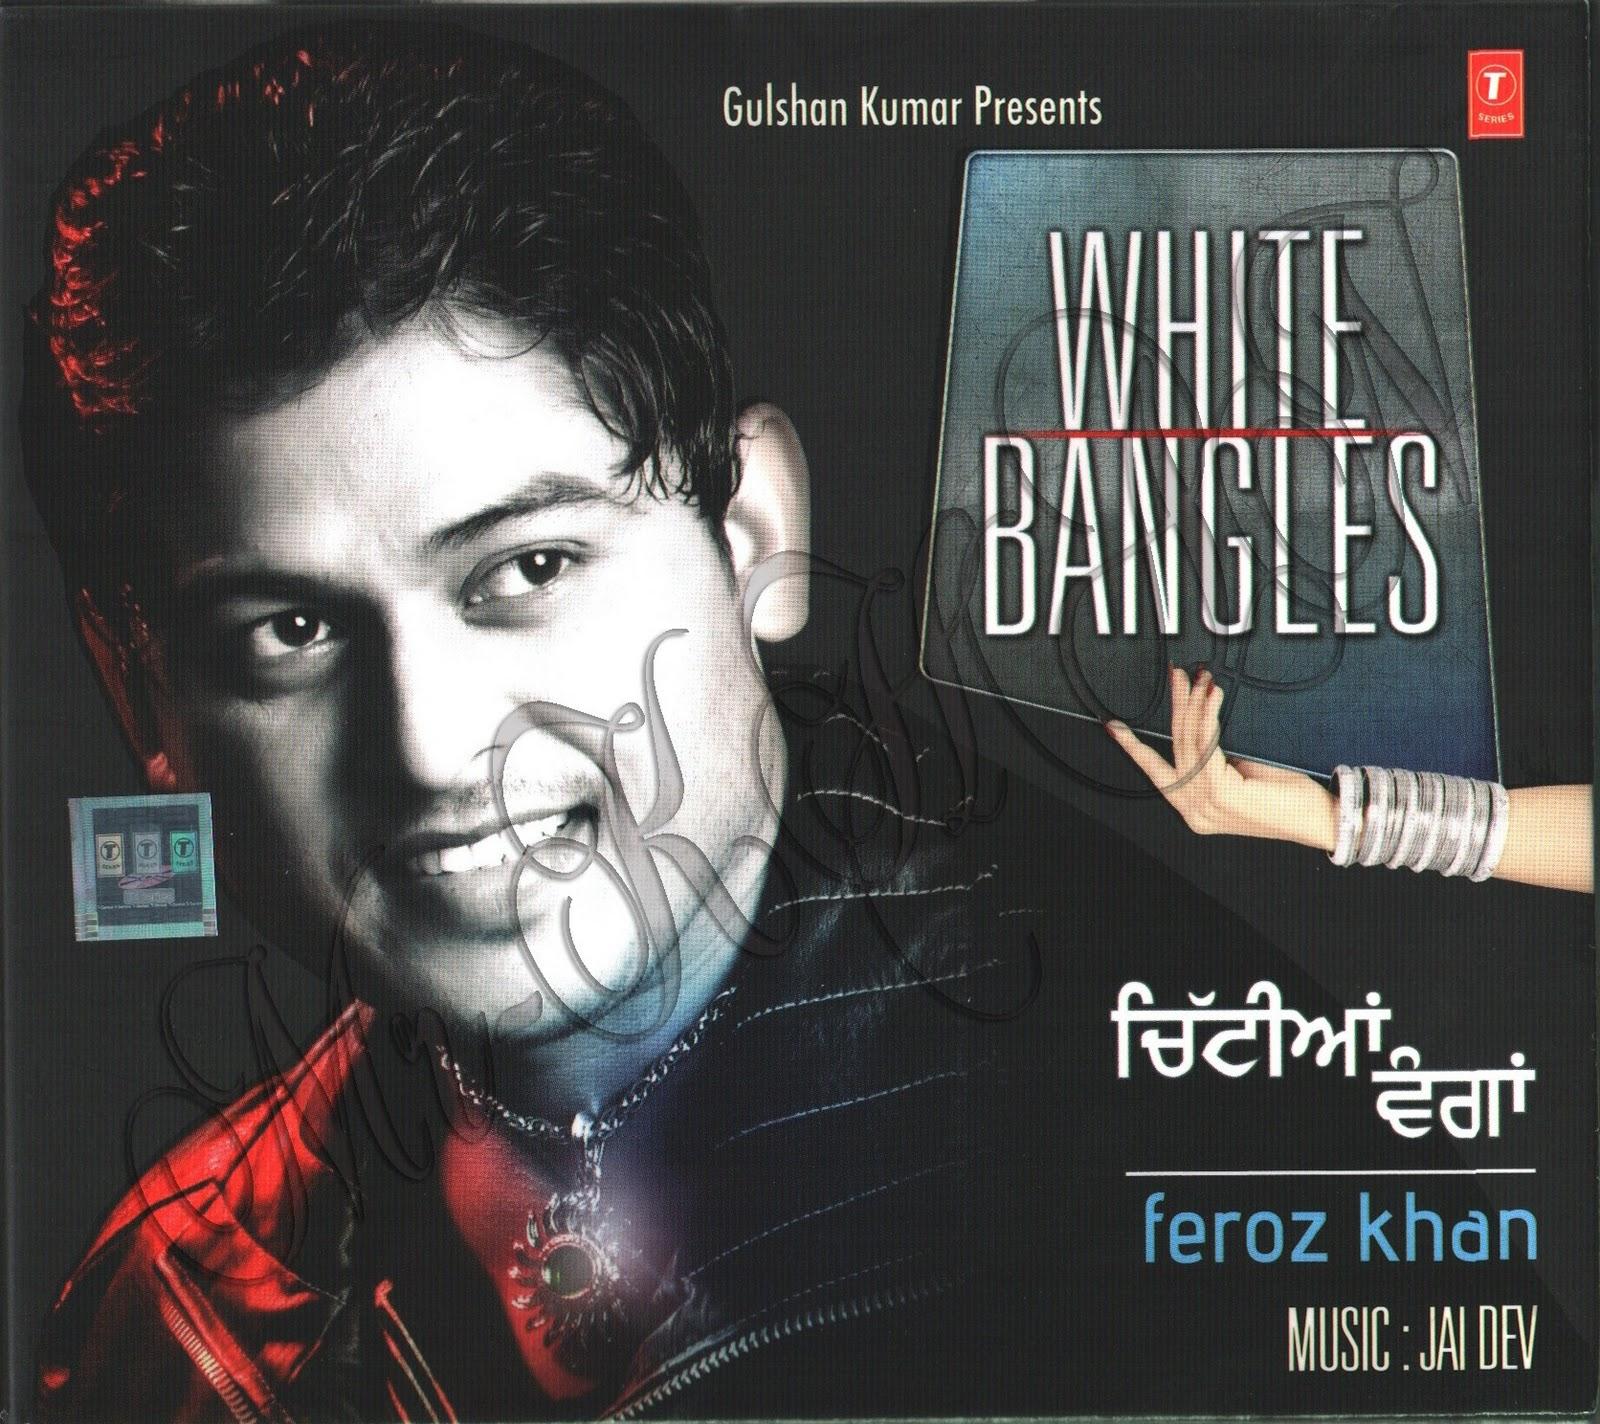 Dil Diyan Gallan Mp3 Song Download: Feroz Khan White Bangles Album Mp3 Songs Free Download